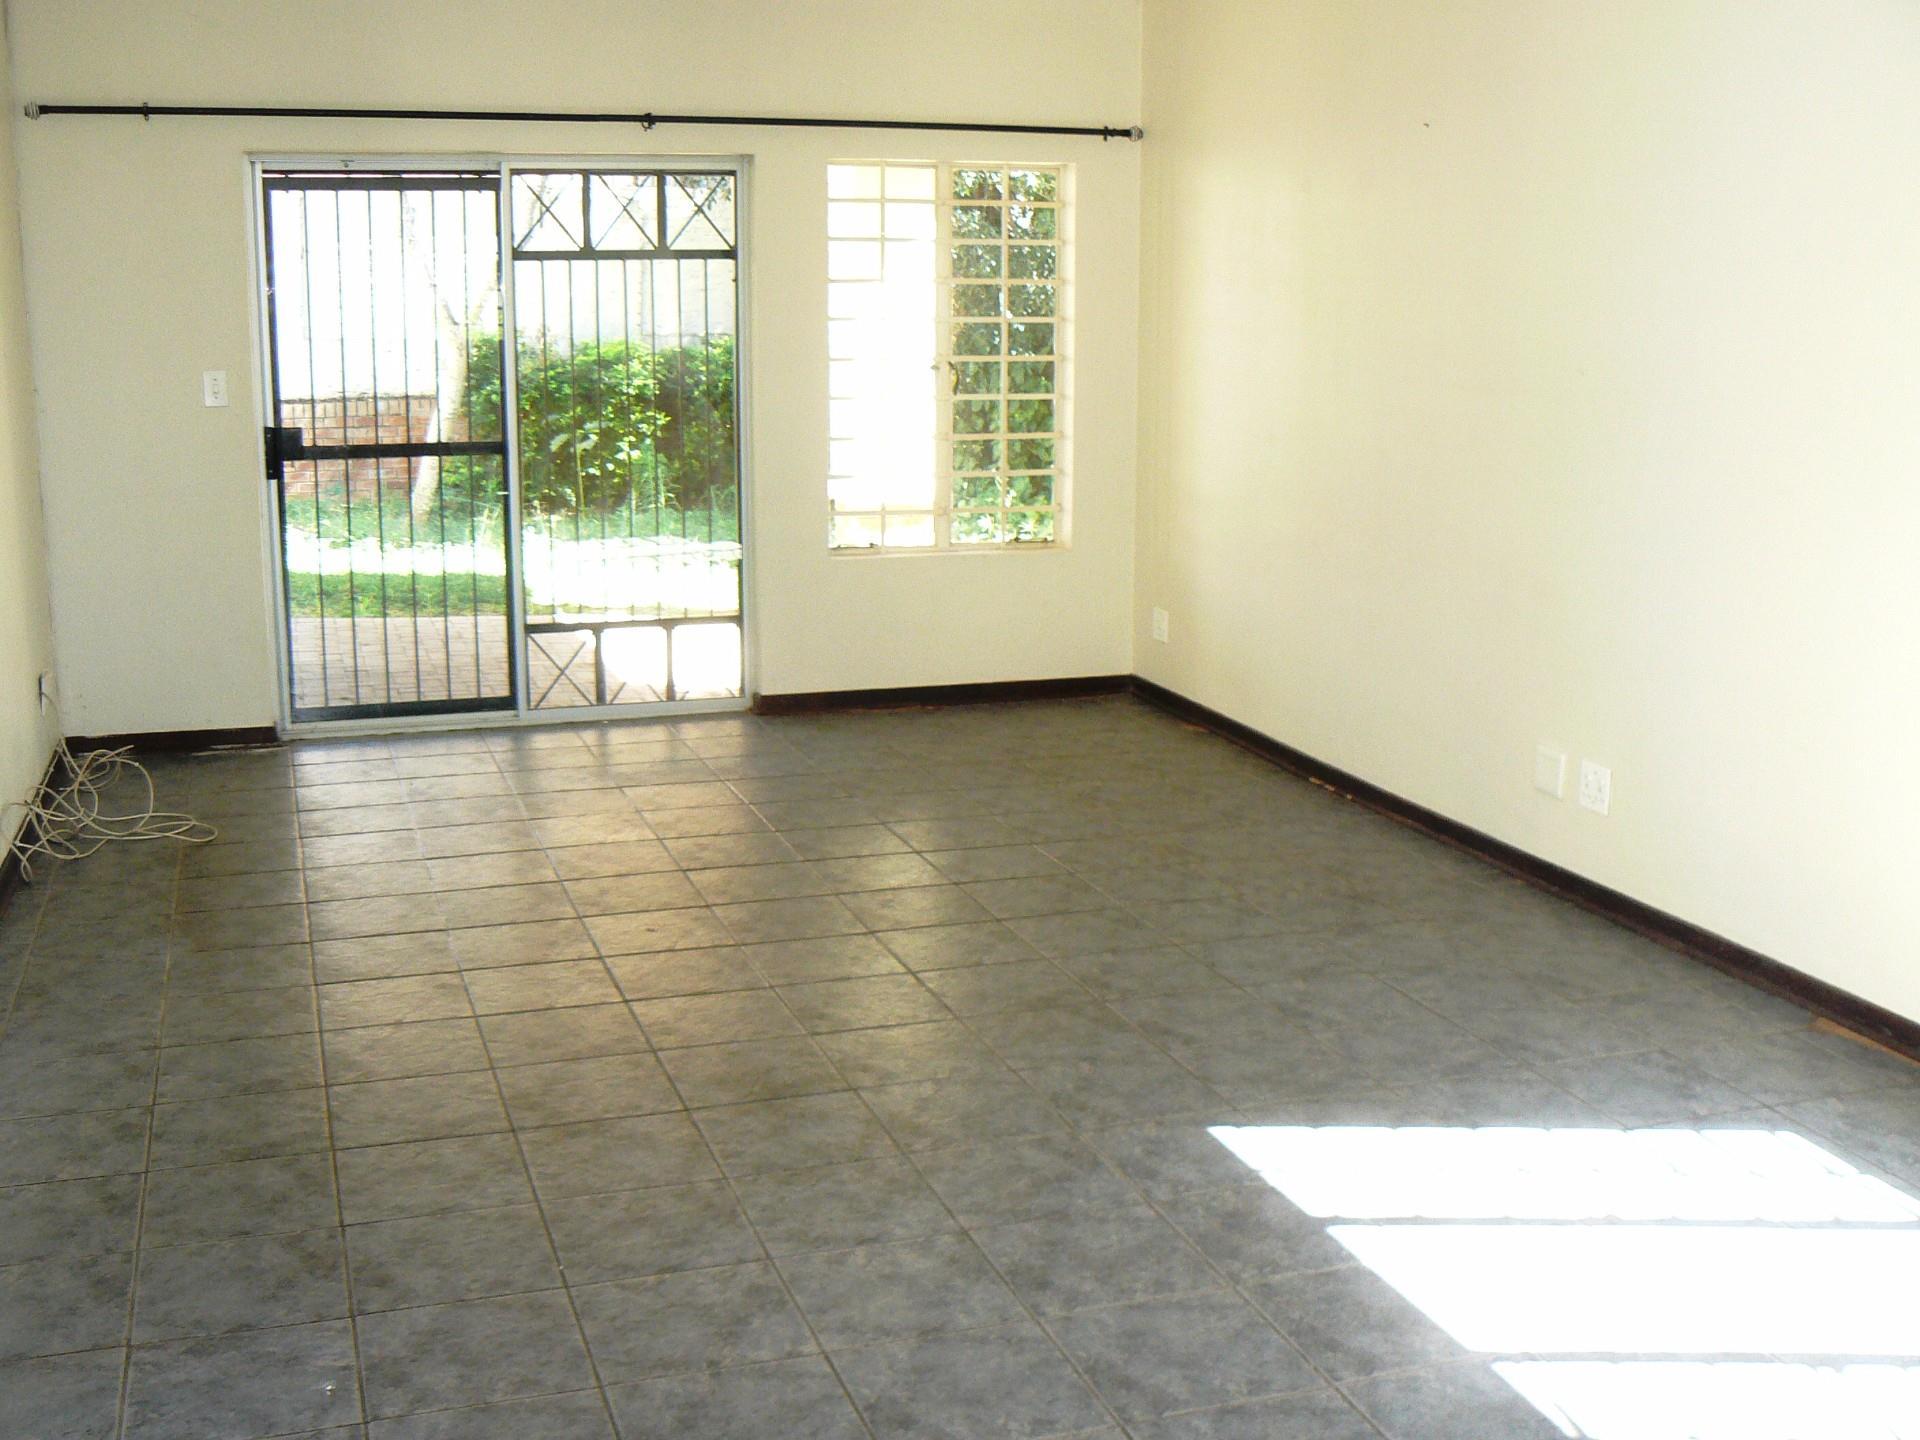 West Acres & Ext property for sale. Ref No: 13485783. Picture no 3